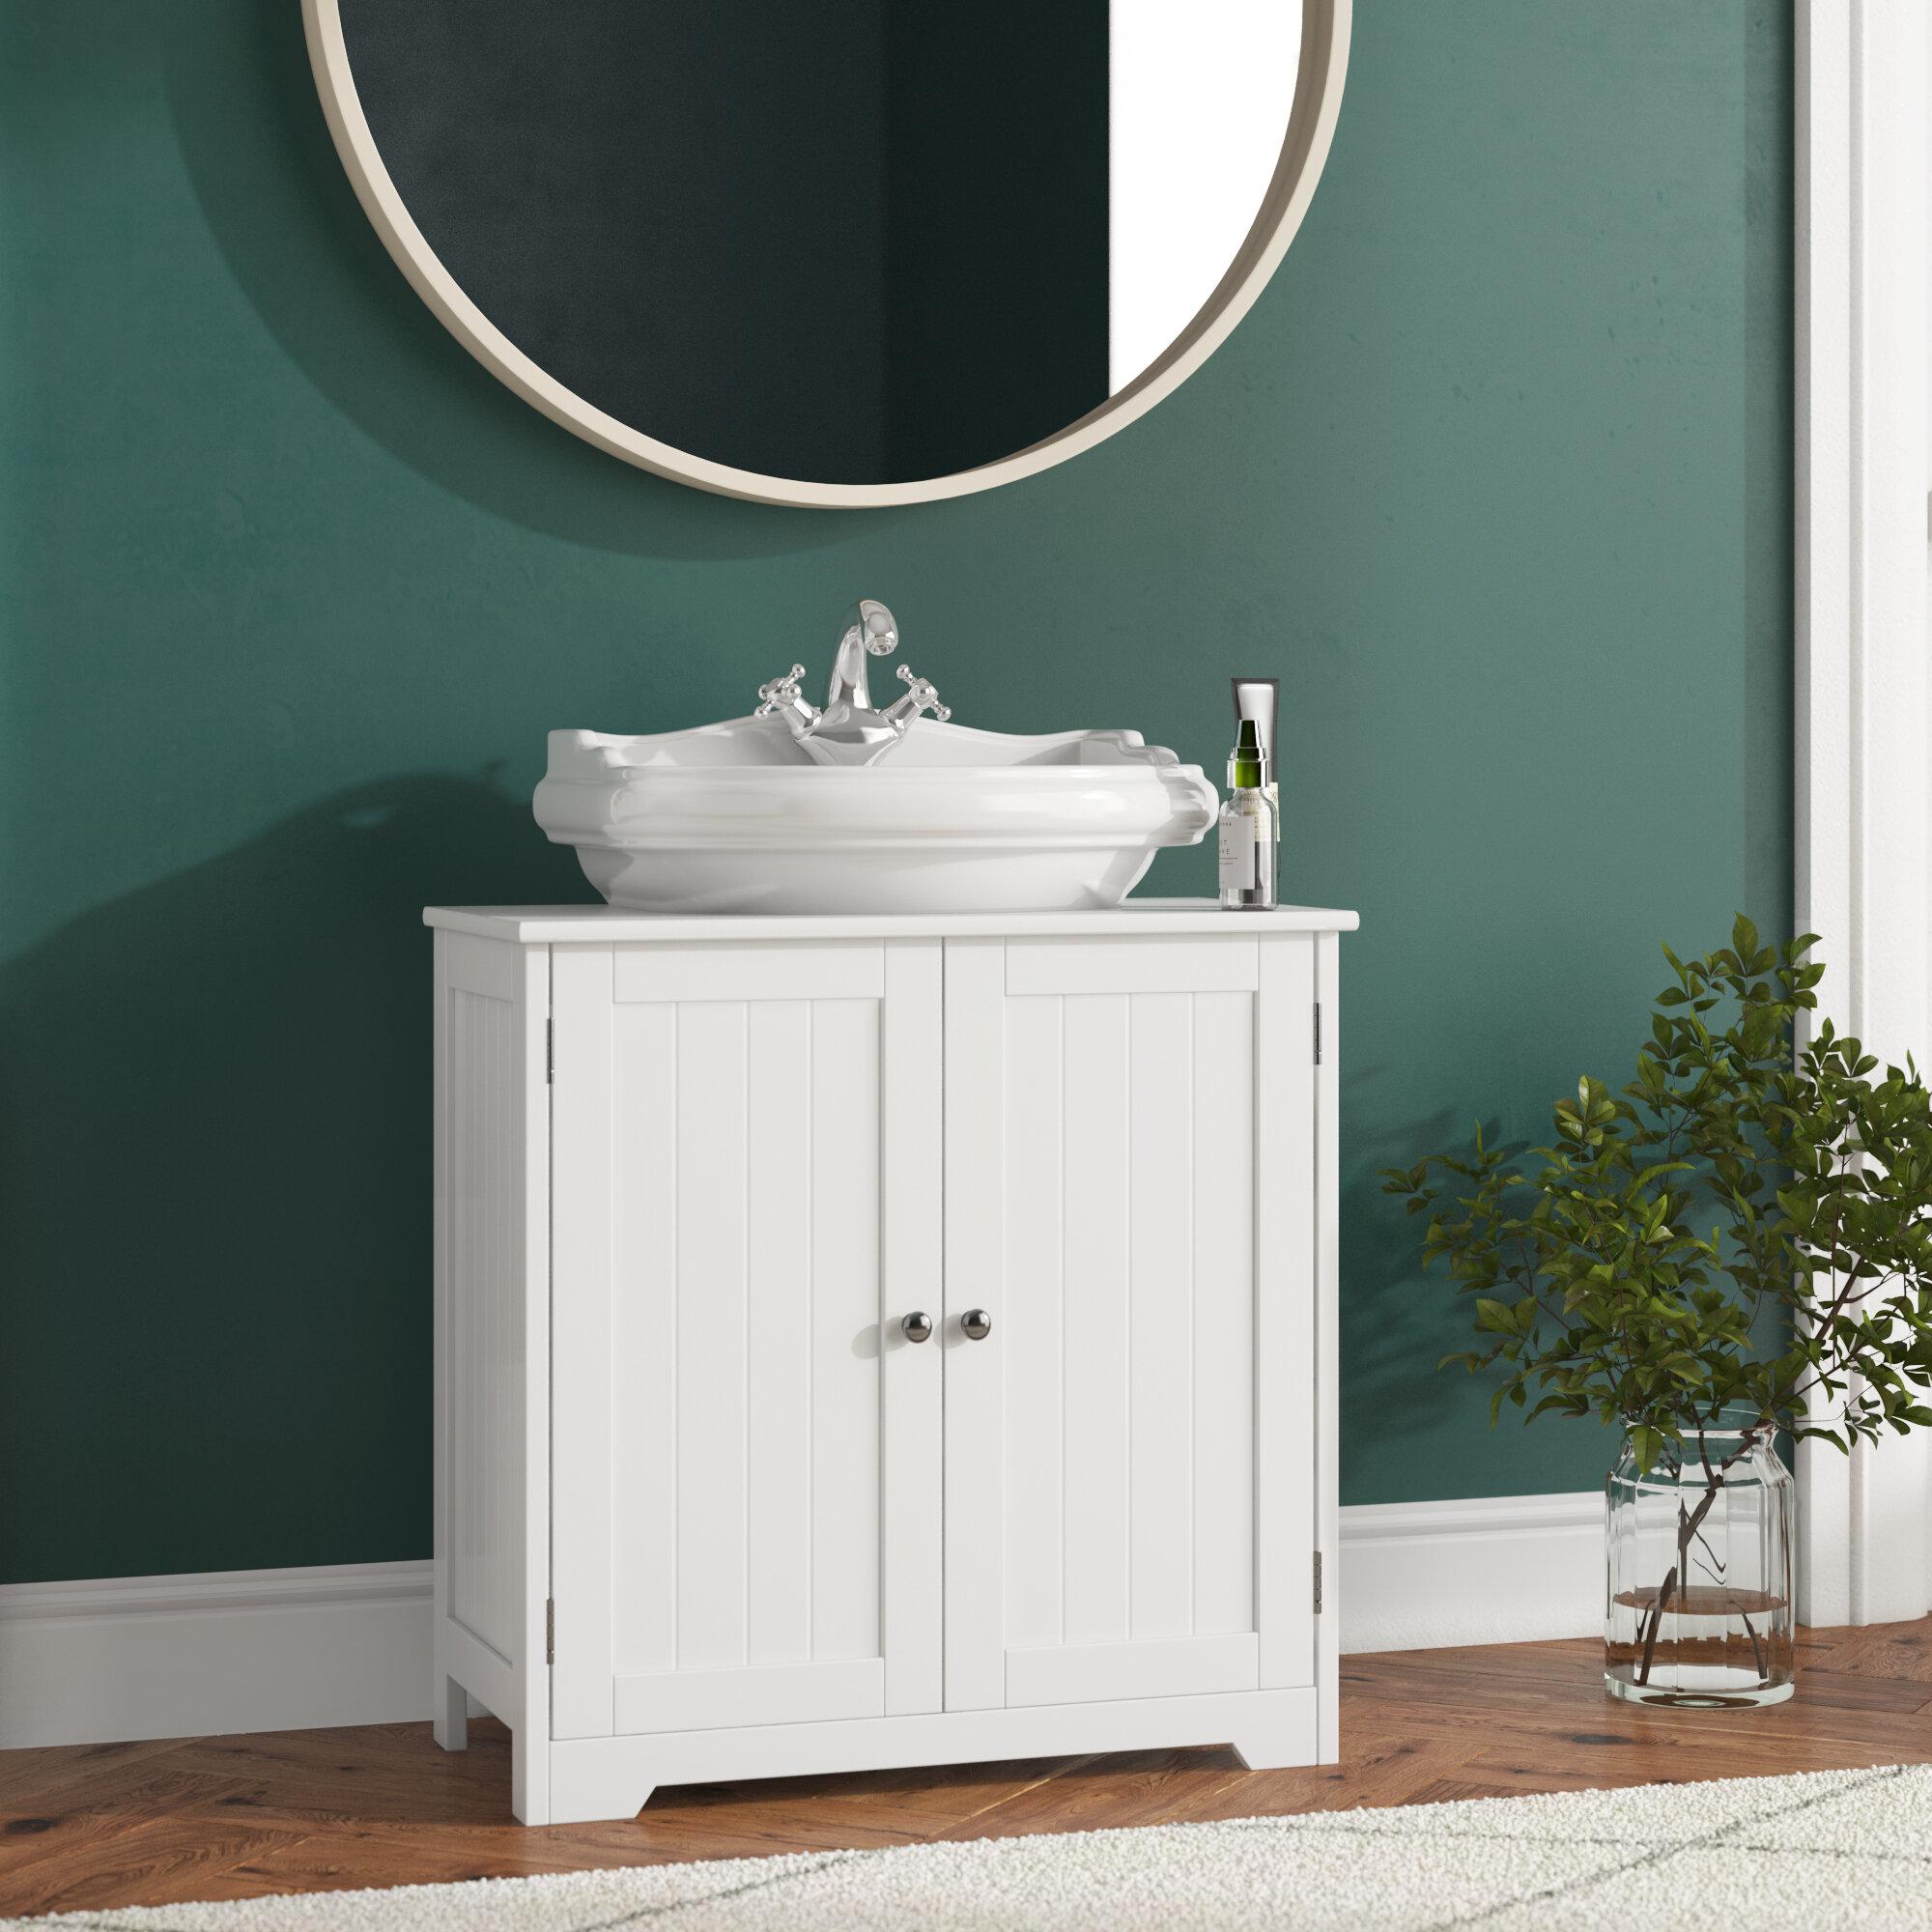 Groovy Vida Priano 60Cm Under Sink Storage Unit Beutiful Home Inspiration Ommitmahrainfo